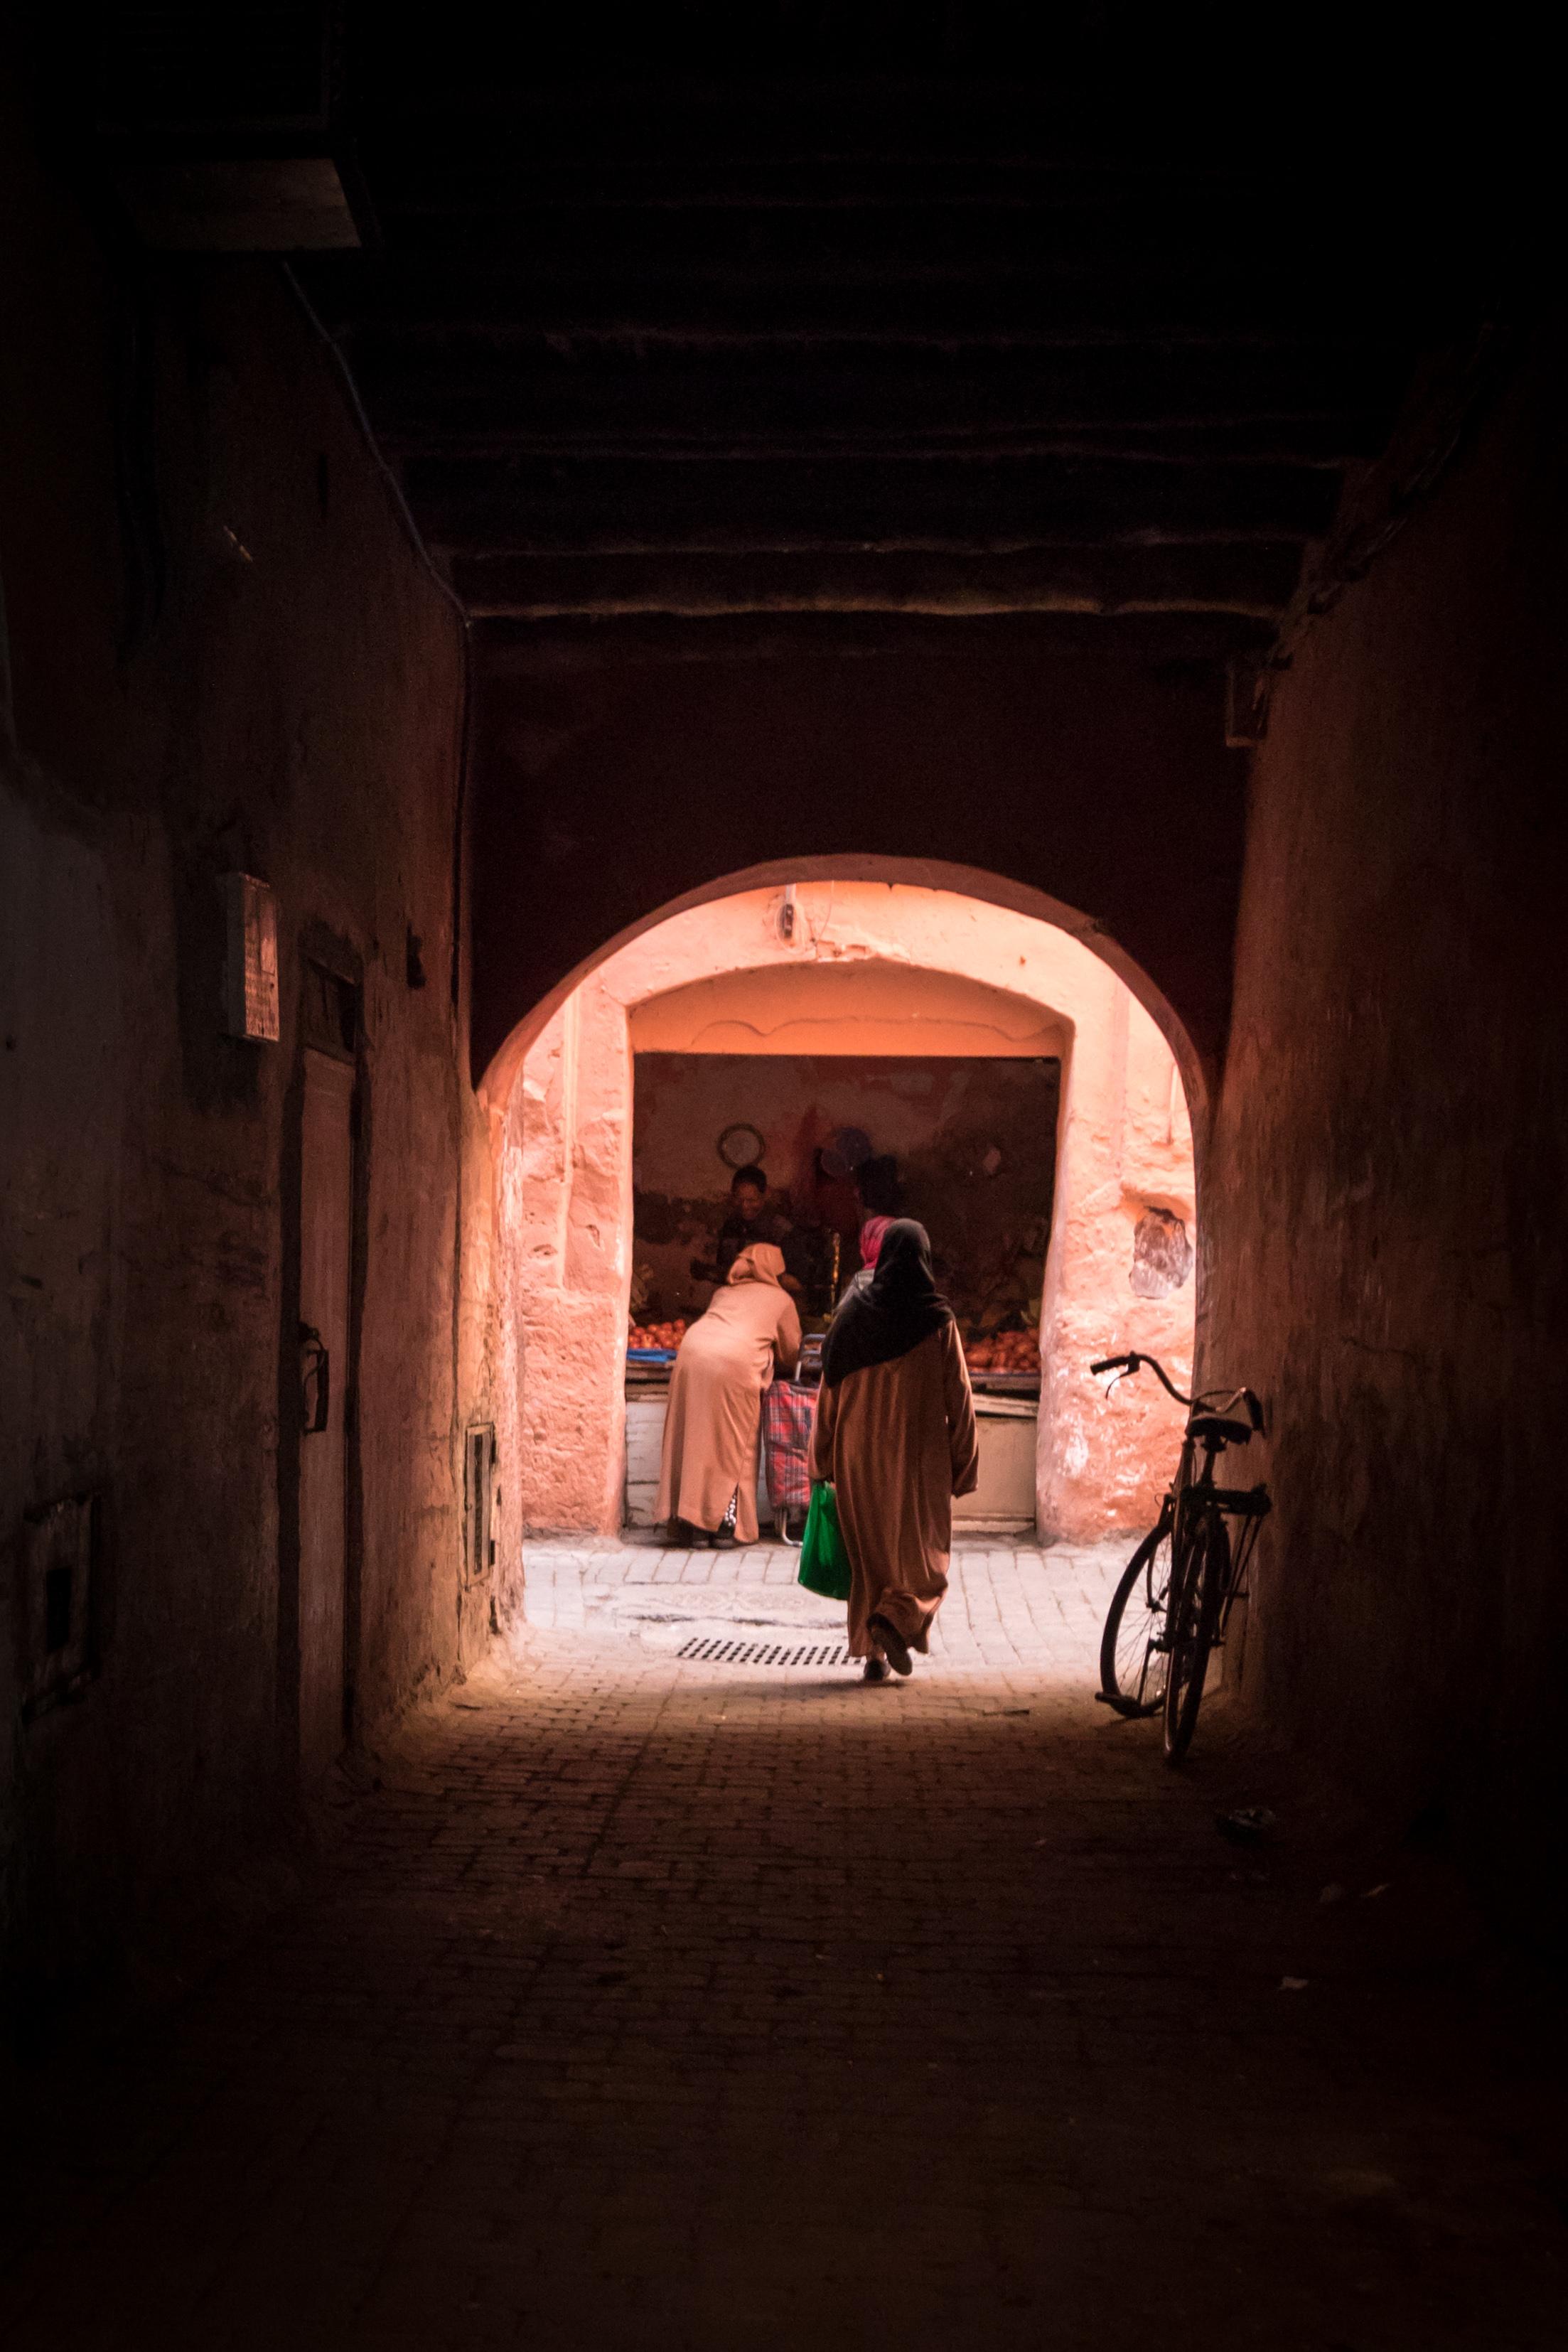 allisonqmccarthy-20170503-morocco-07.jpg